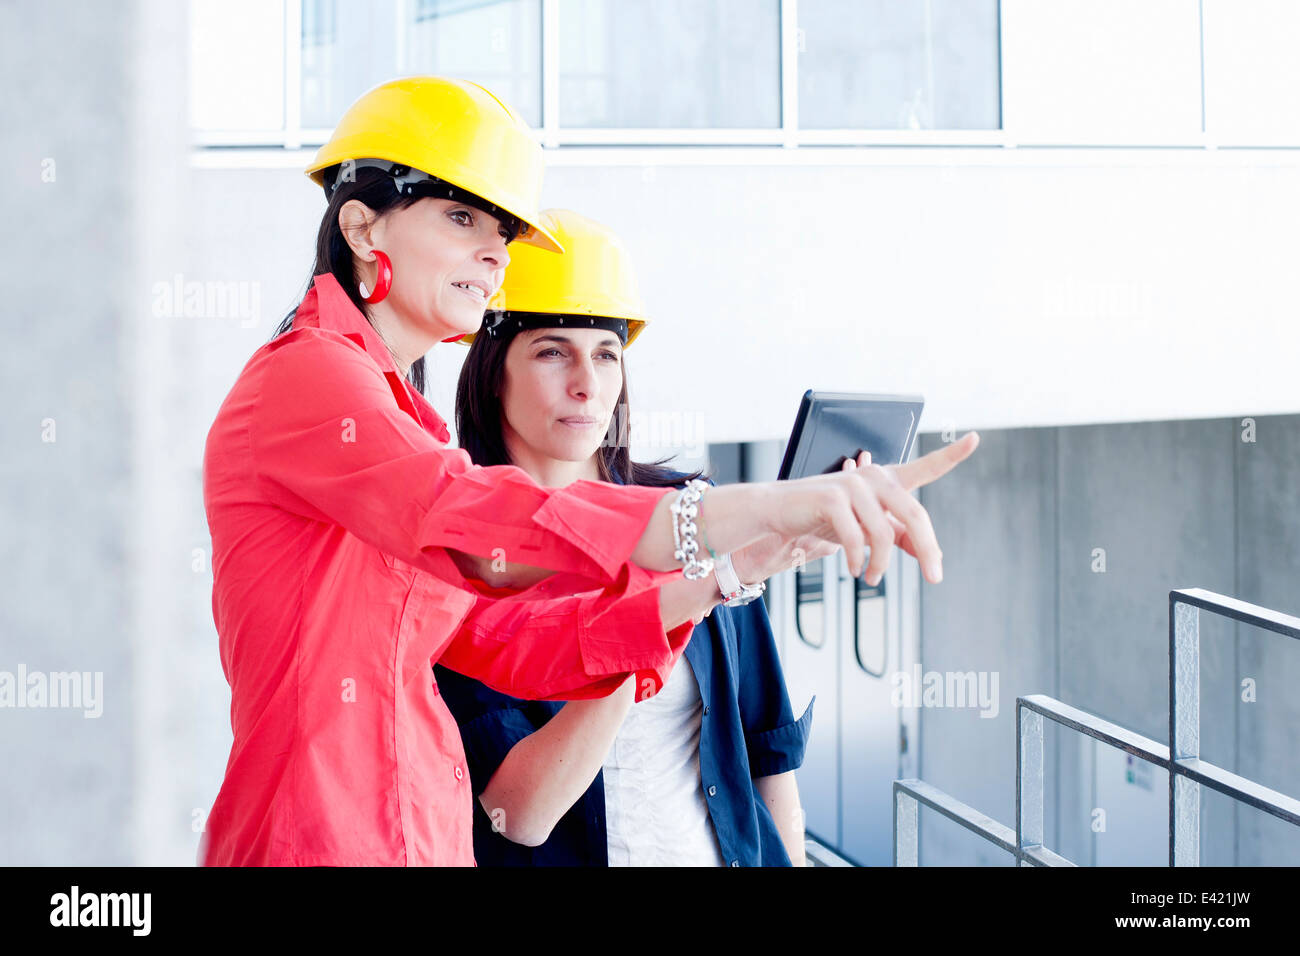 Businesswomen in safety helmet taking photograph - Stock Image